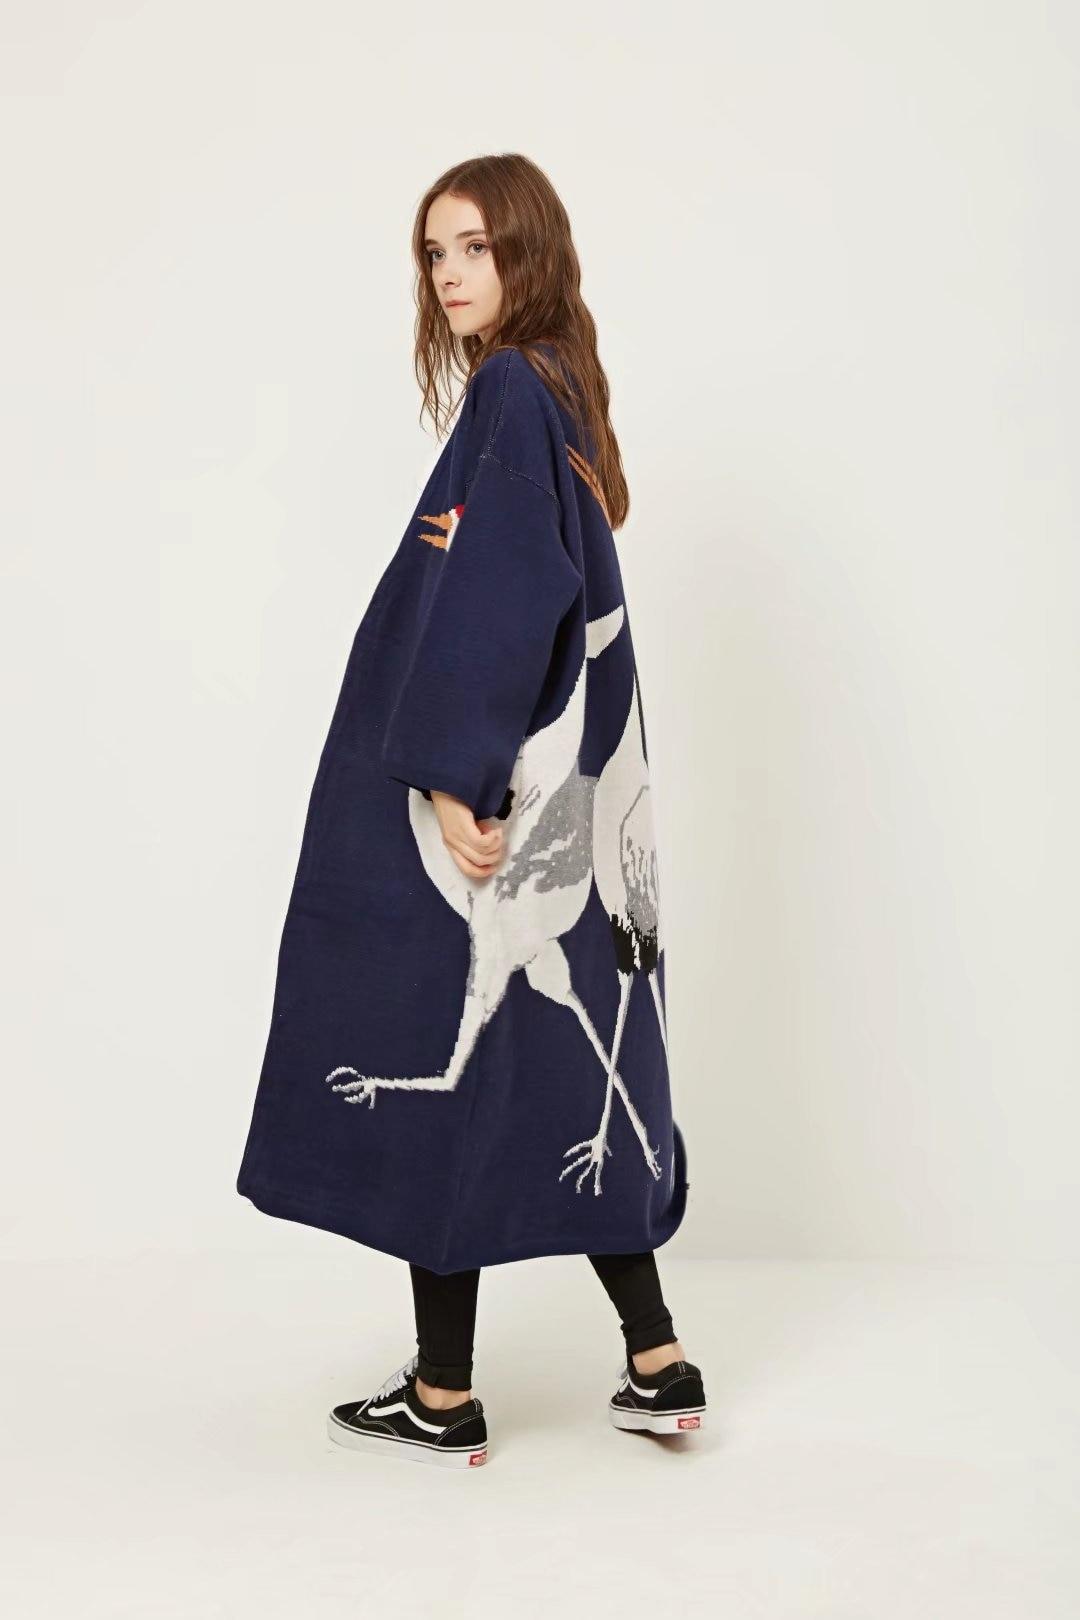 Creine Hooded Windbreaker Jacket Women Raincoats